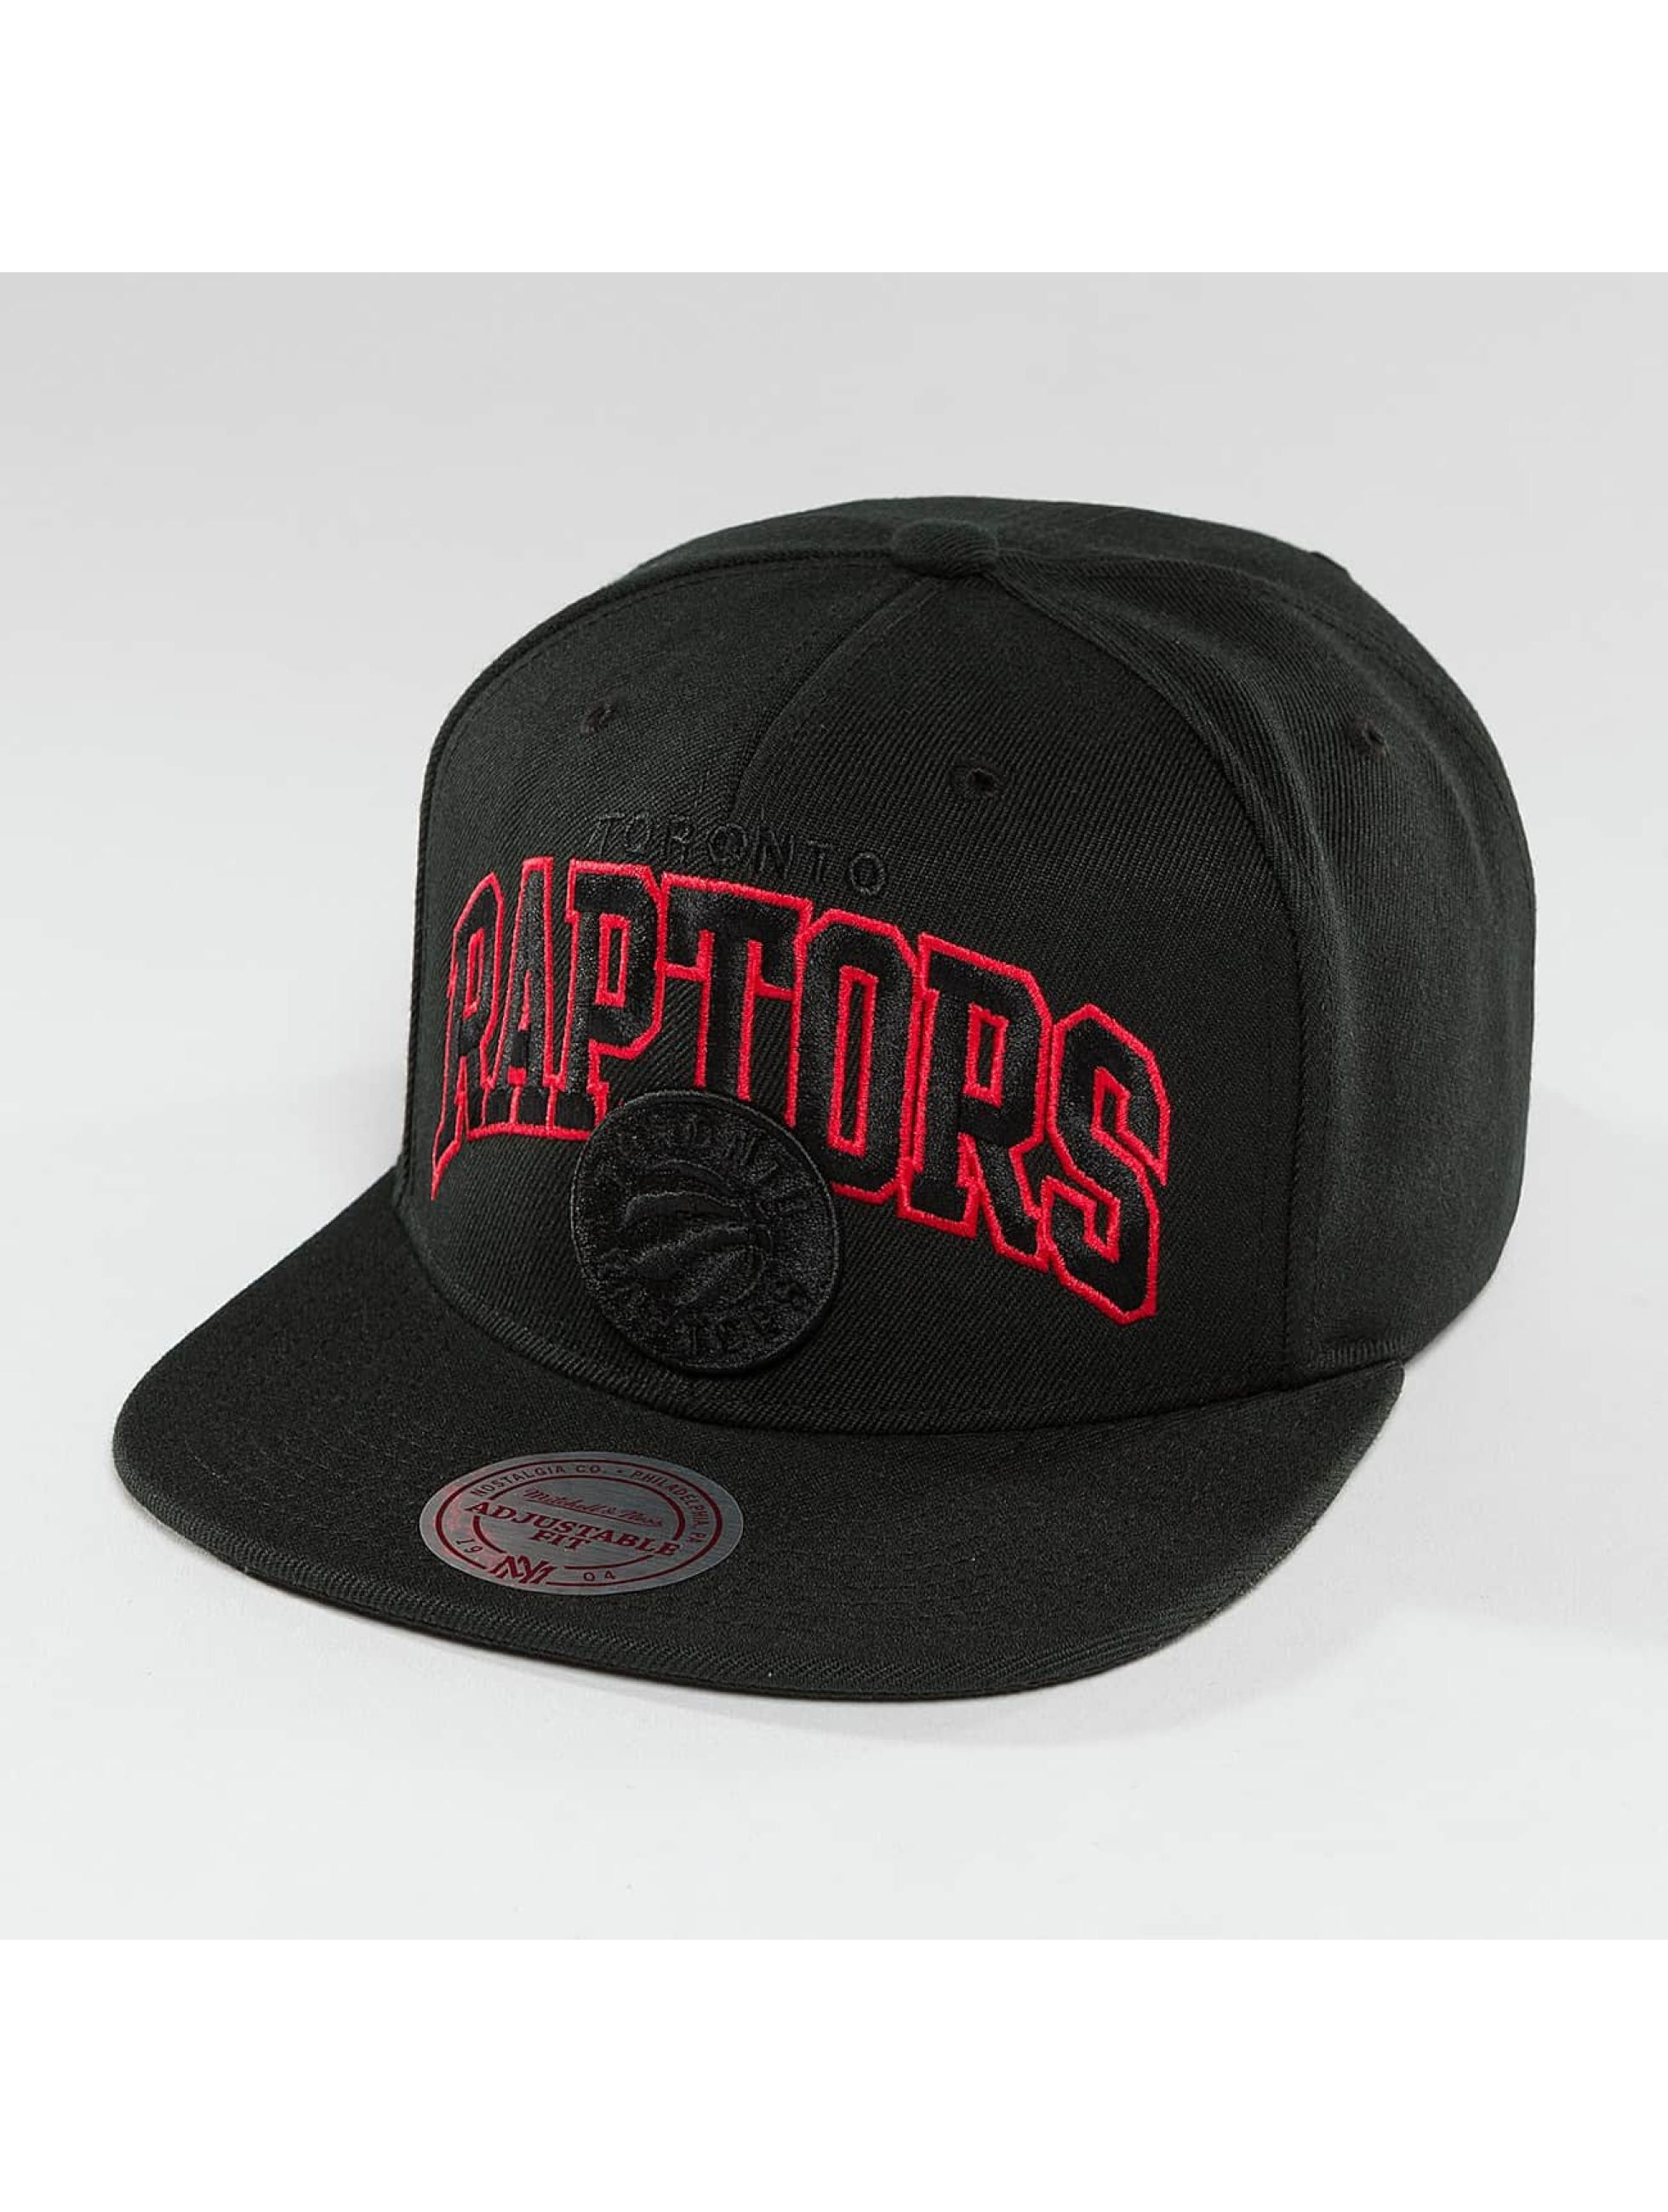 Mitchell & Ness Casquette Snapback & Strapback Red Pop Toronto Raptors noir